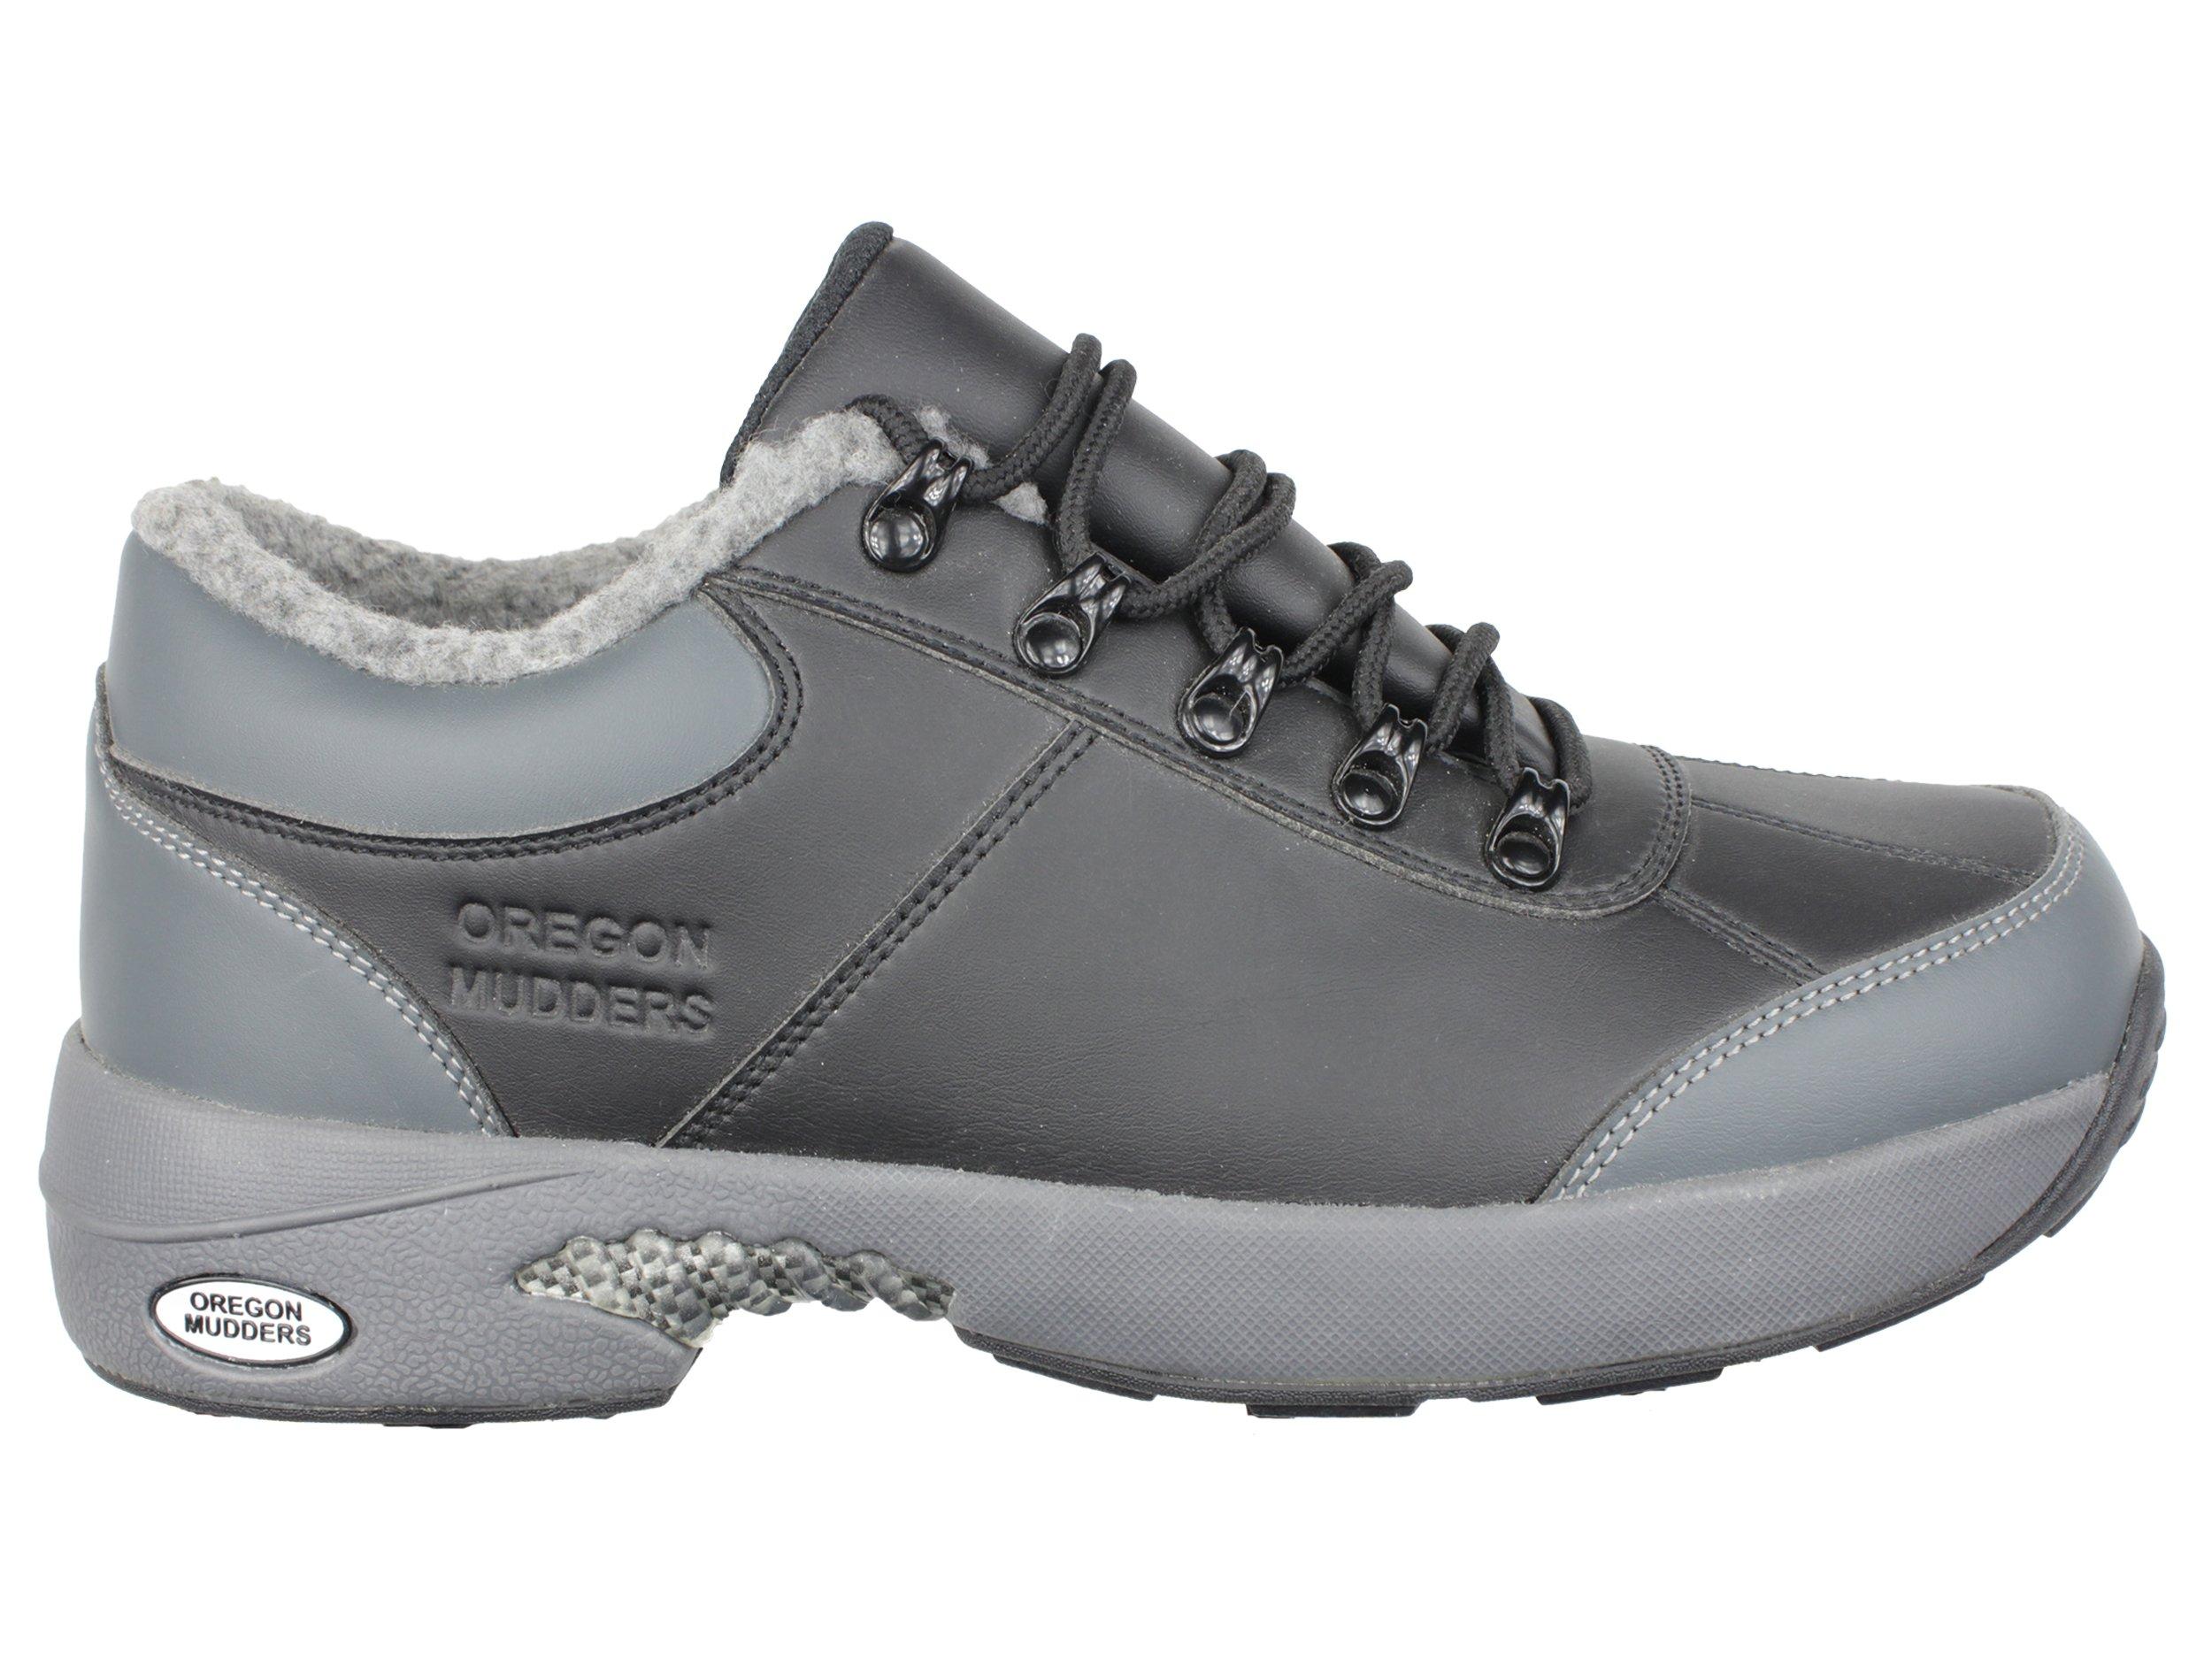 Oregon Mudders Womens CW400N Waterproof Oxford Golf Shoe with Turf Nipple Sole 9M US Womens by Oregon Mudders (Image #2)